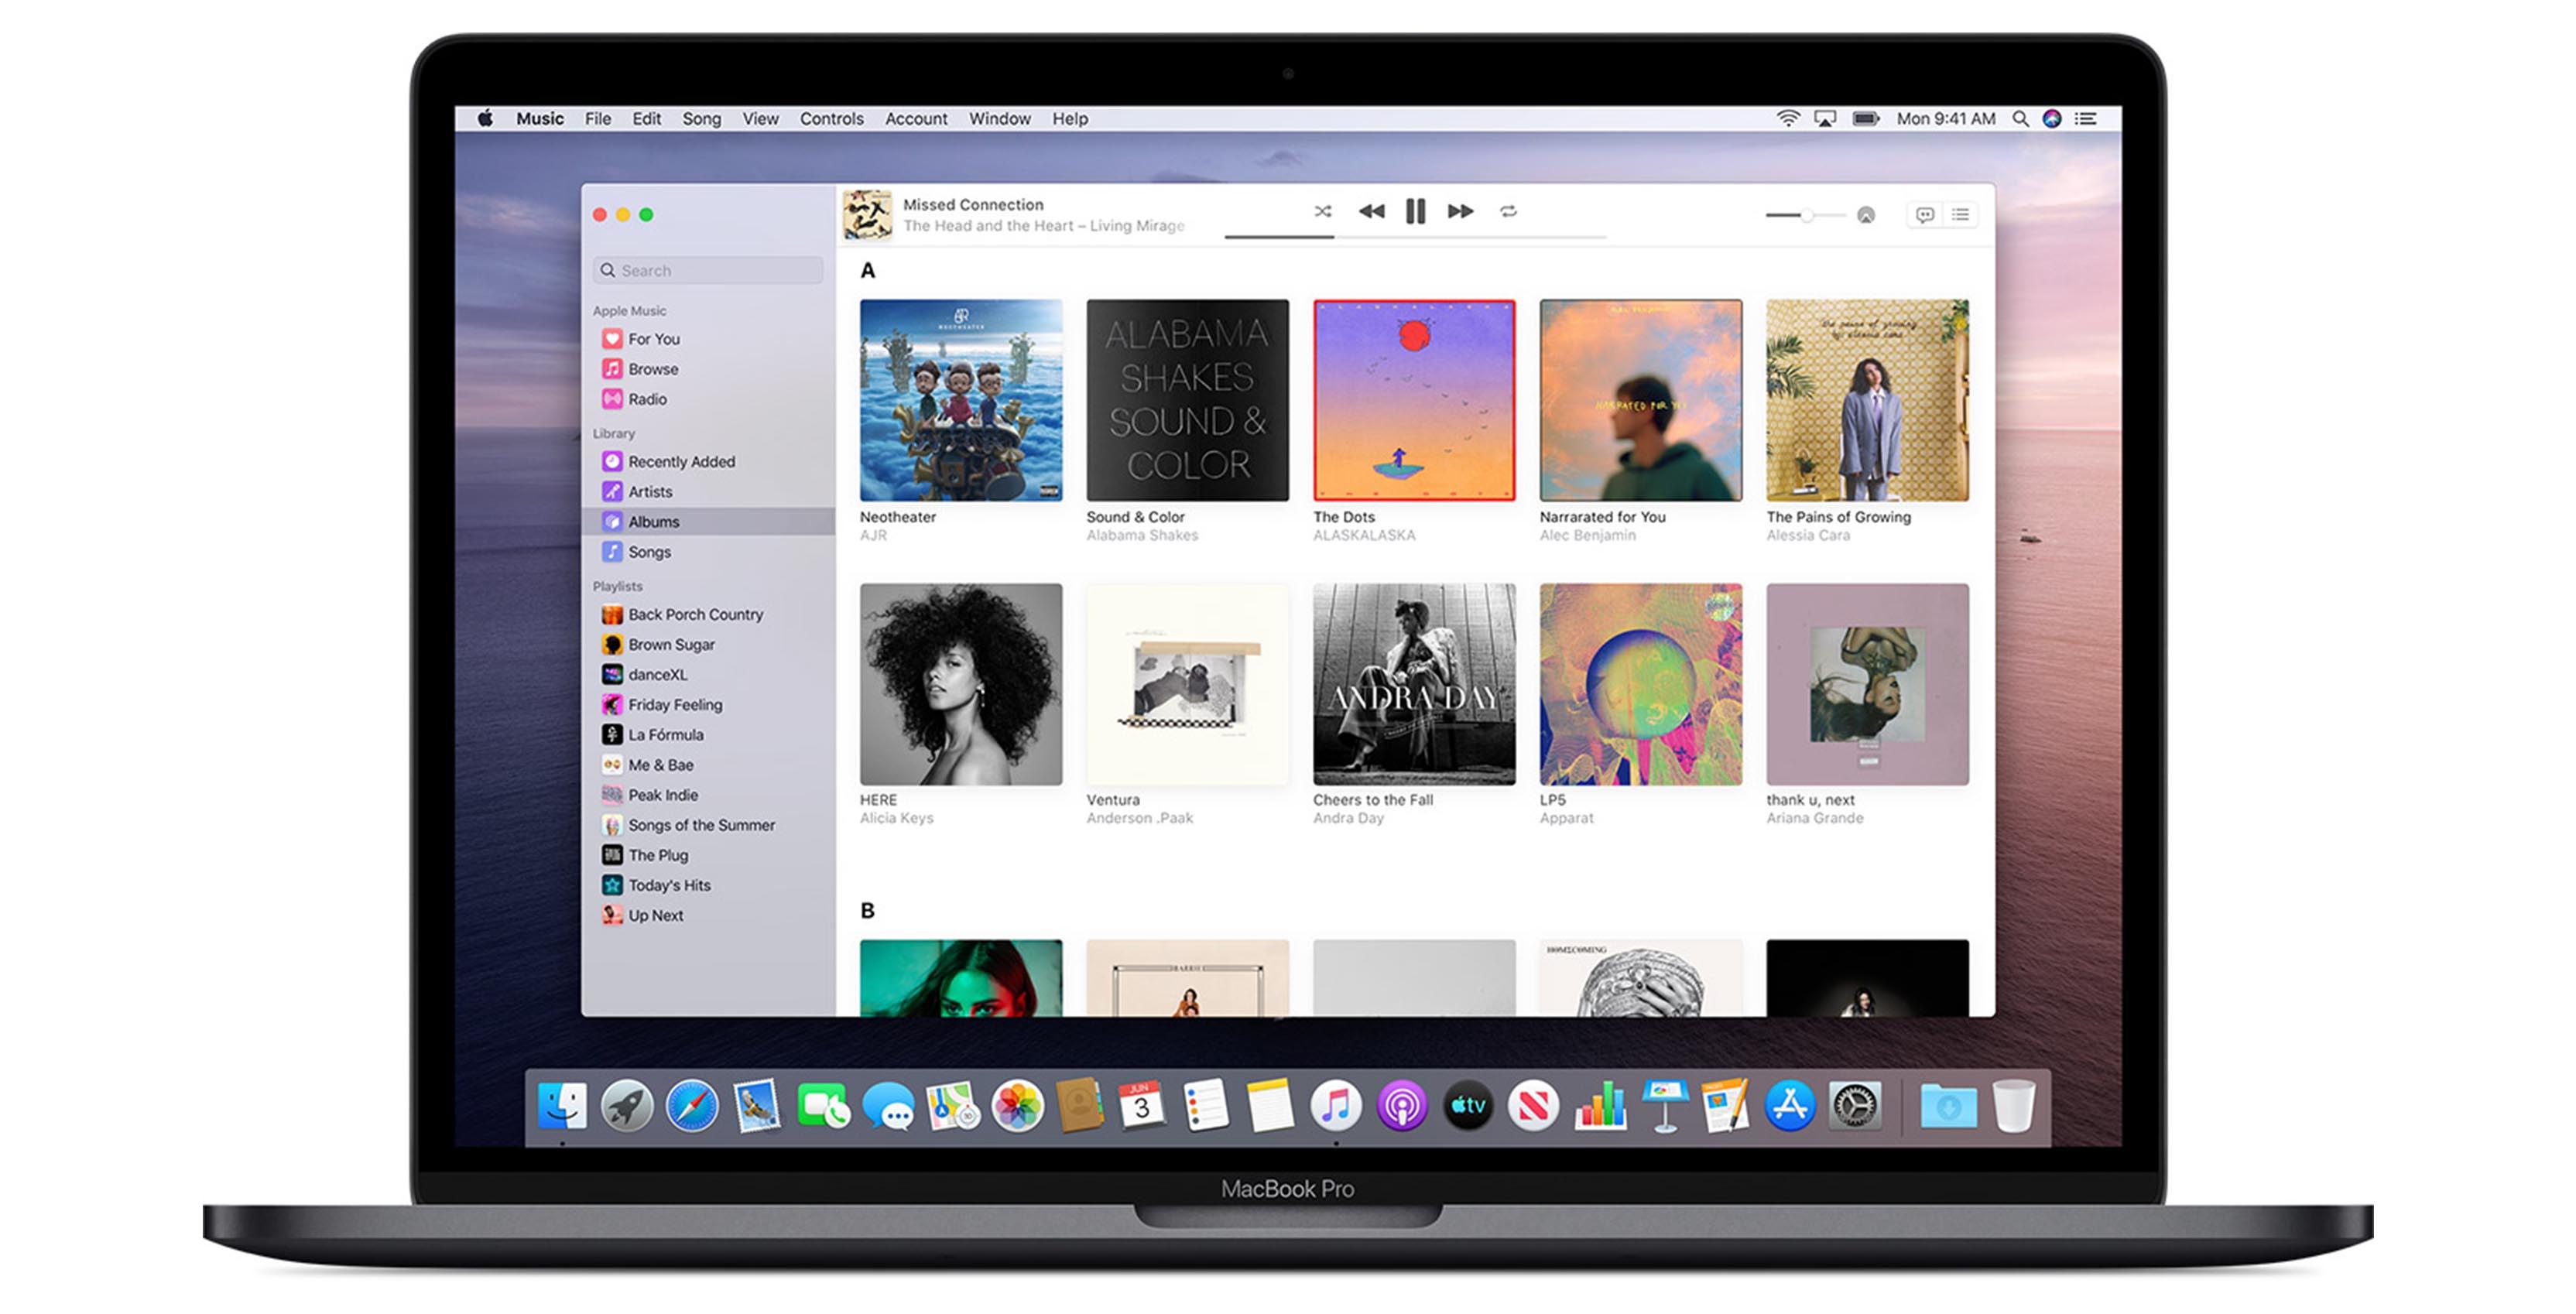 Apple Music on macOS Catalina